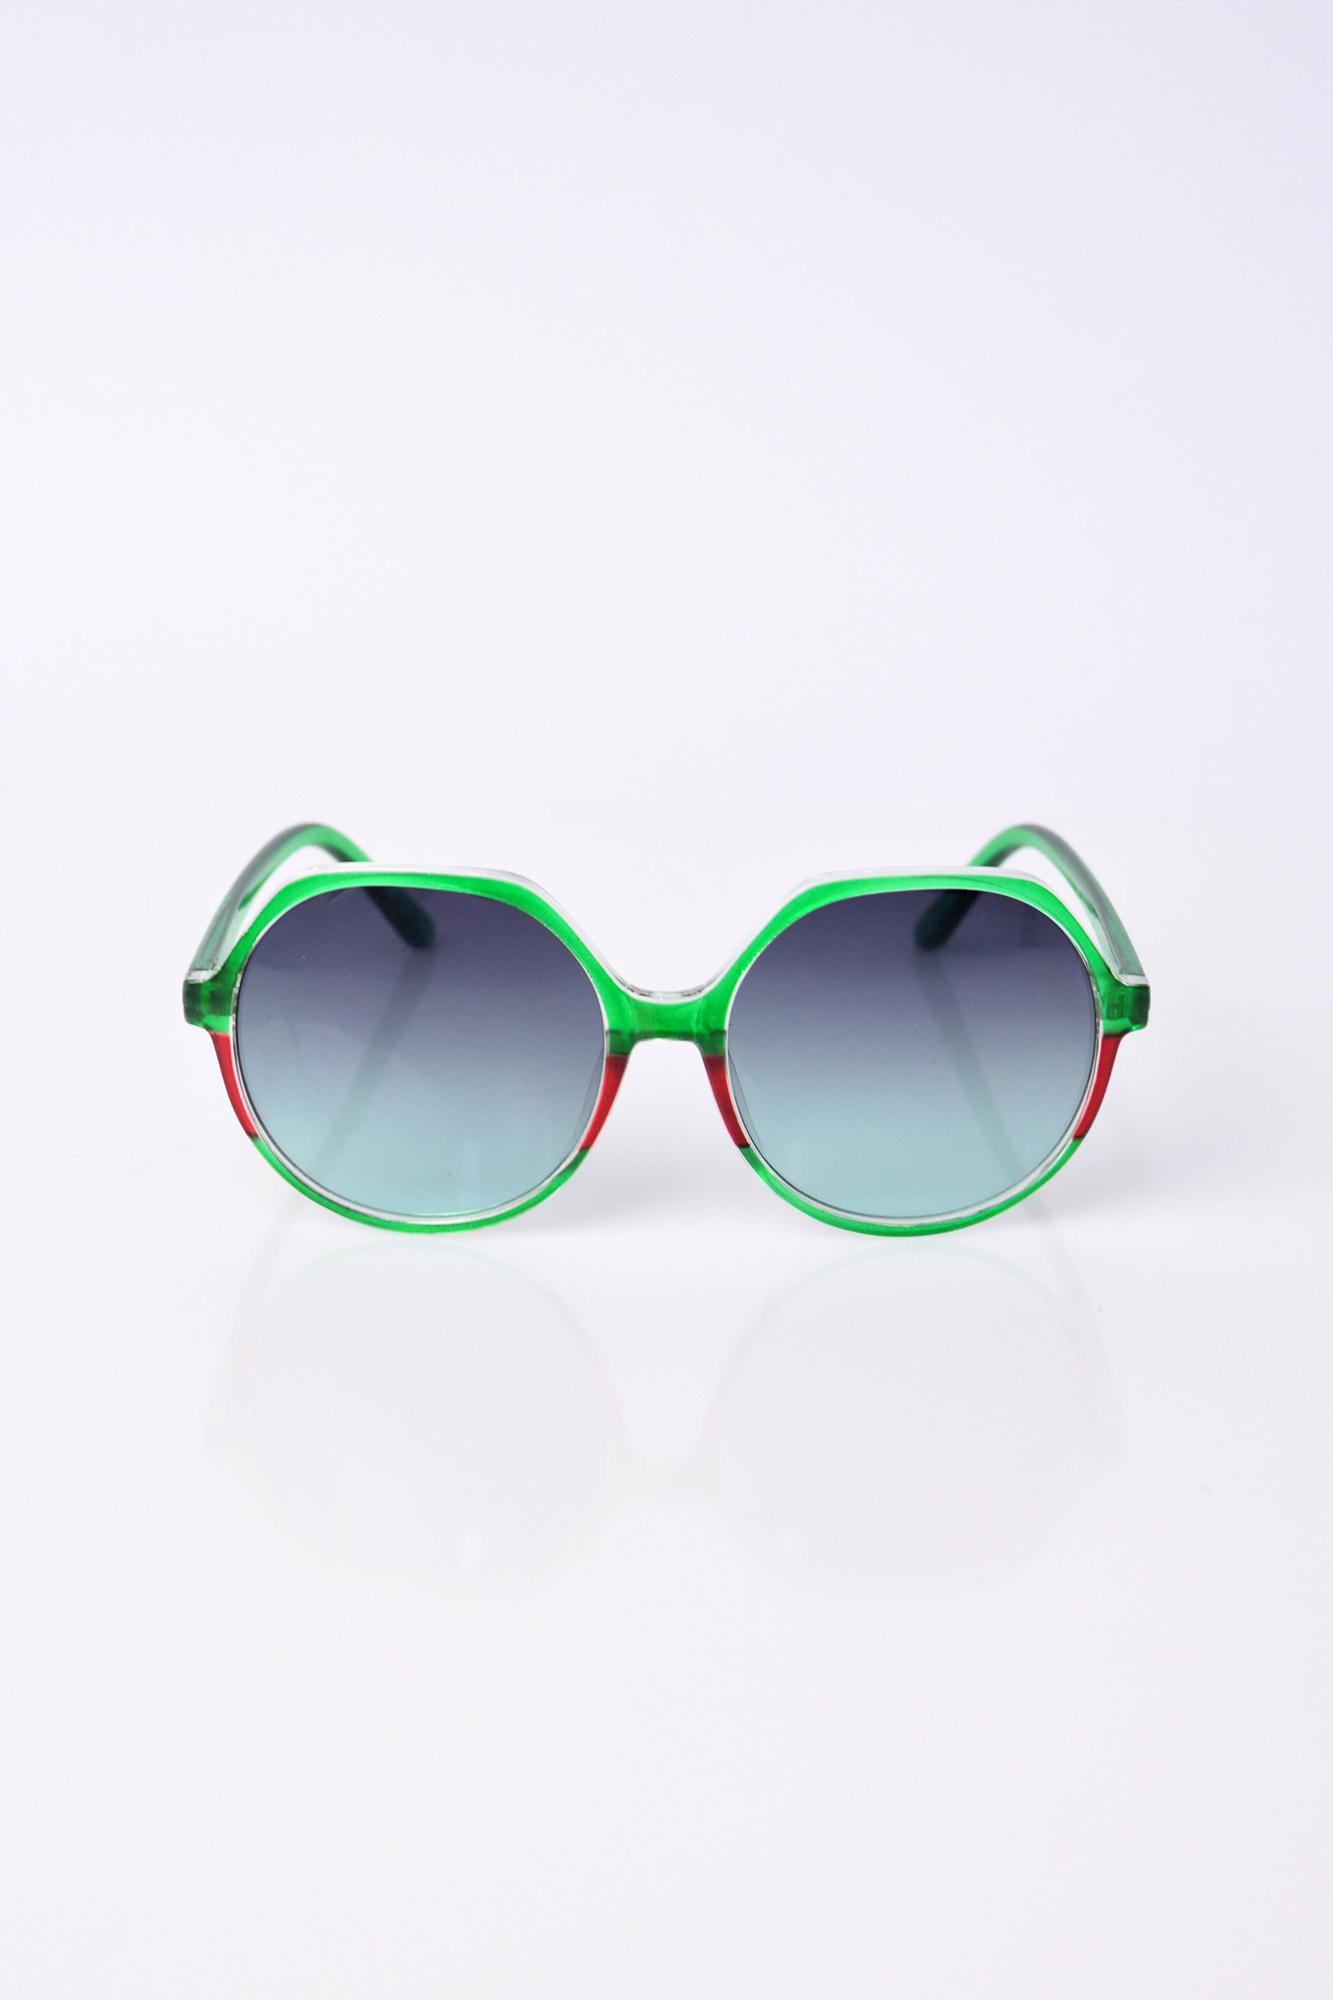 fcd009c296 Γυαλιά ηλίου στρογγυλά. Tap to expand